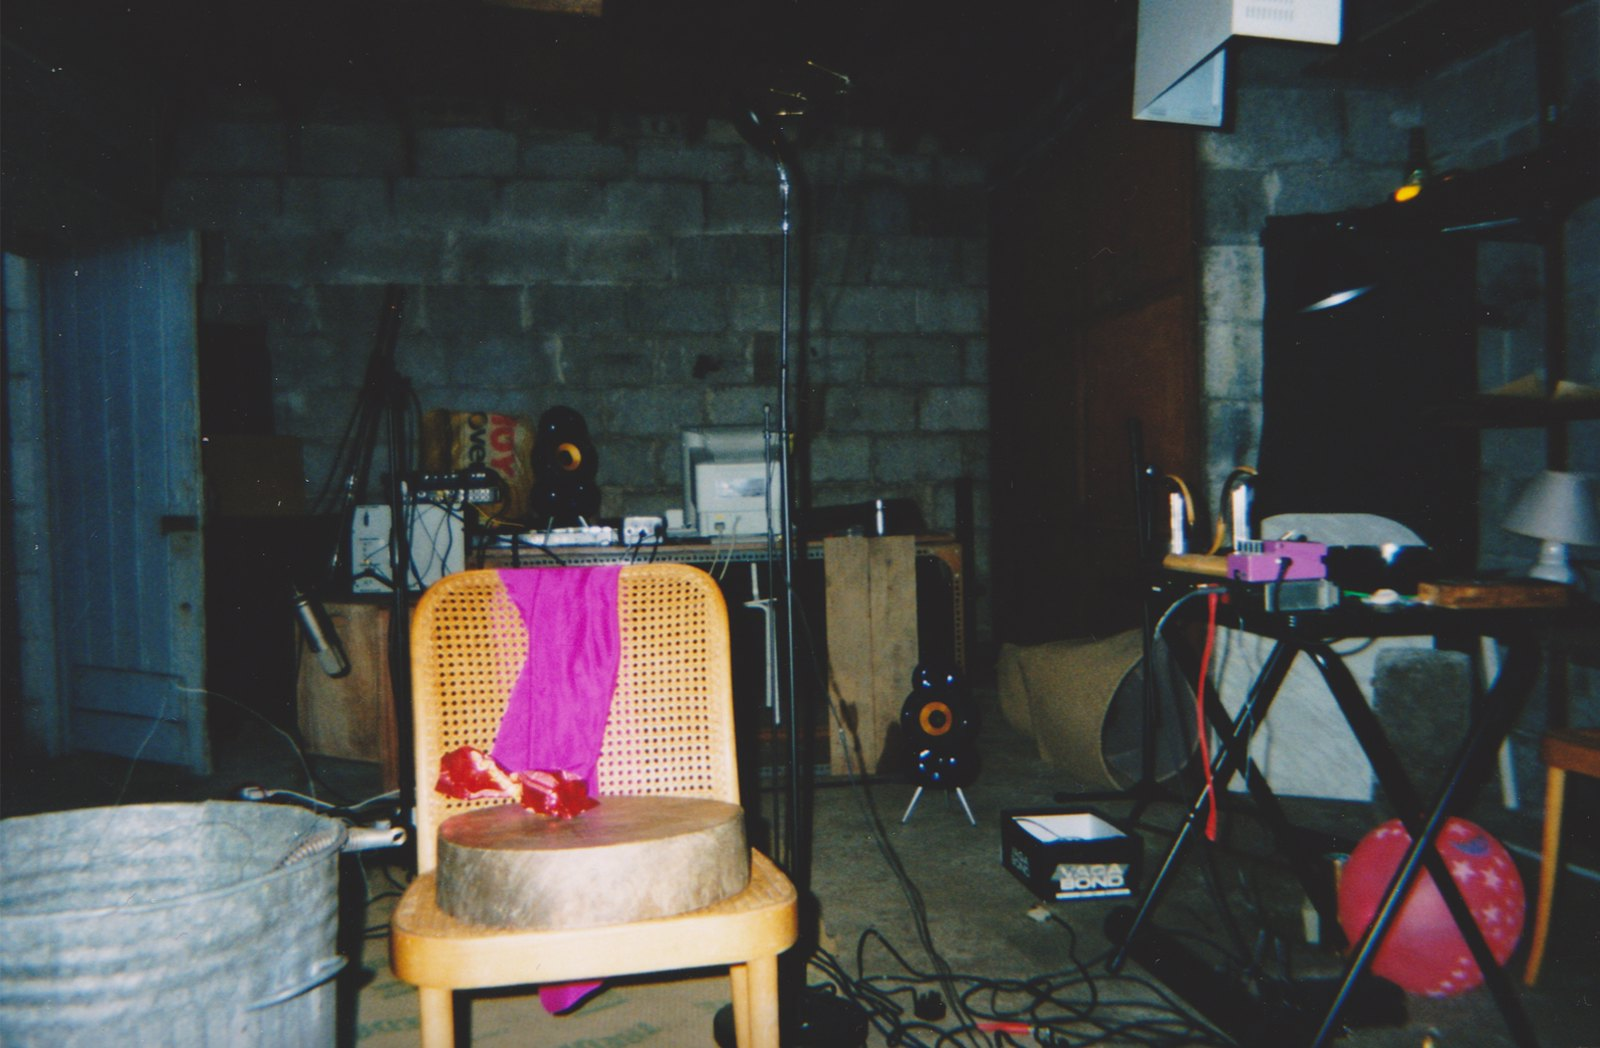 Amygdala Recording Session 2003-2